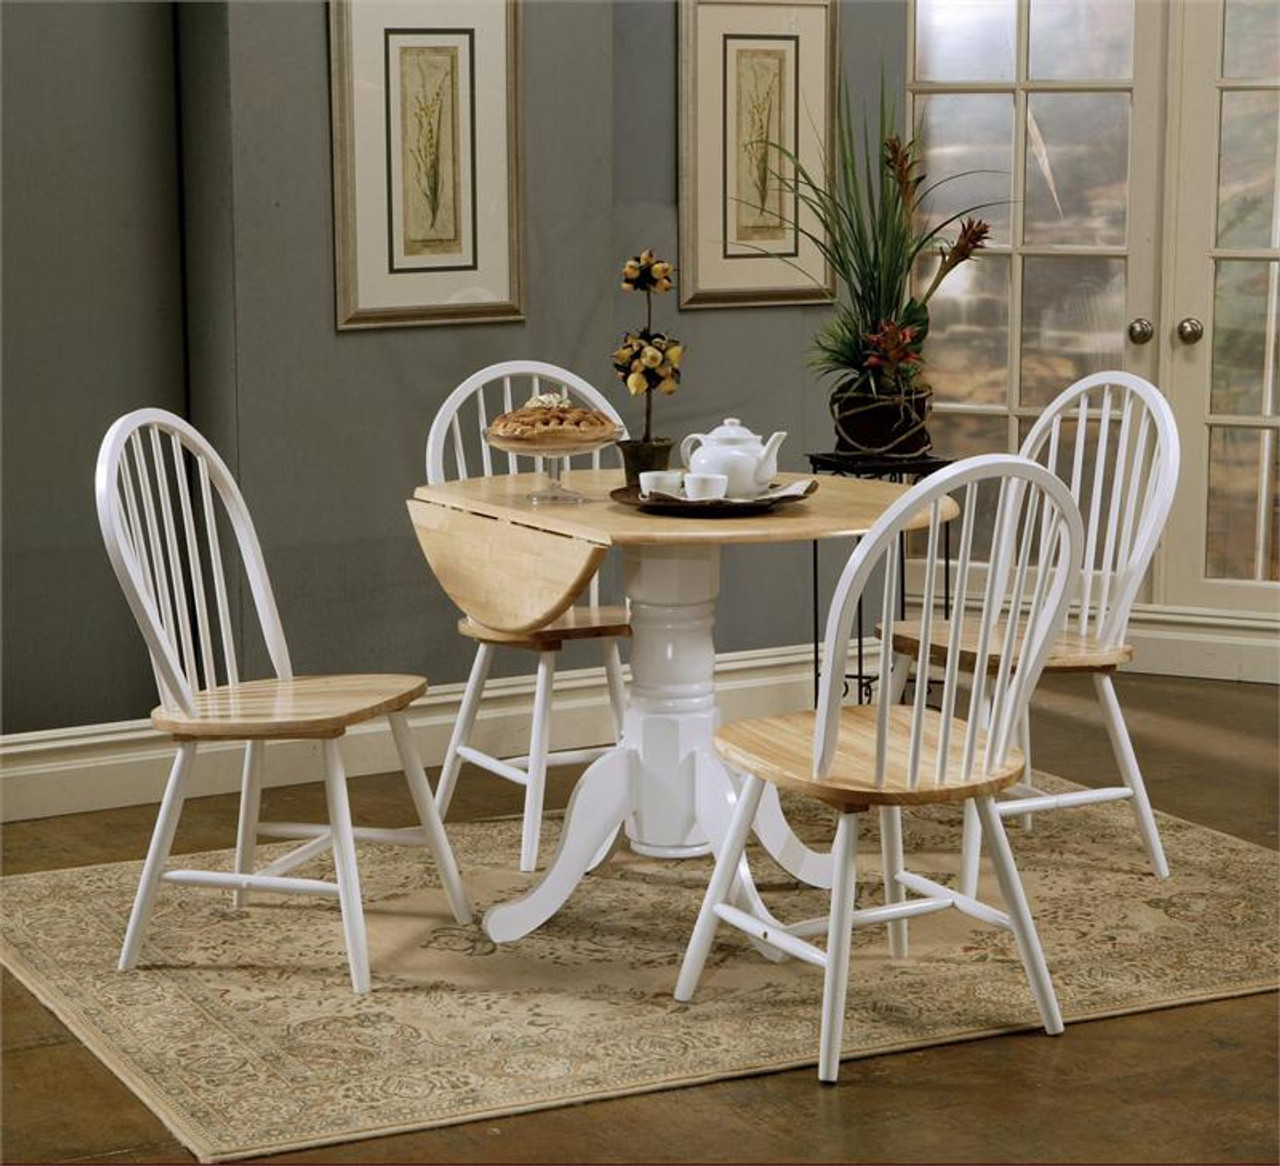 Round Butcher Block Drop-Leaf Kitchen Table w/ Chairs